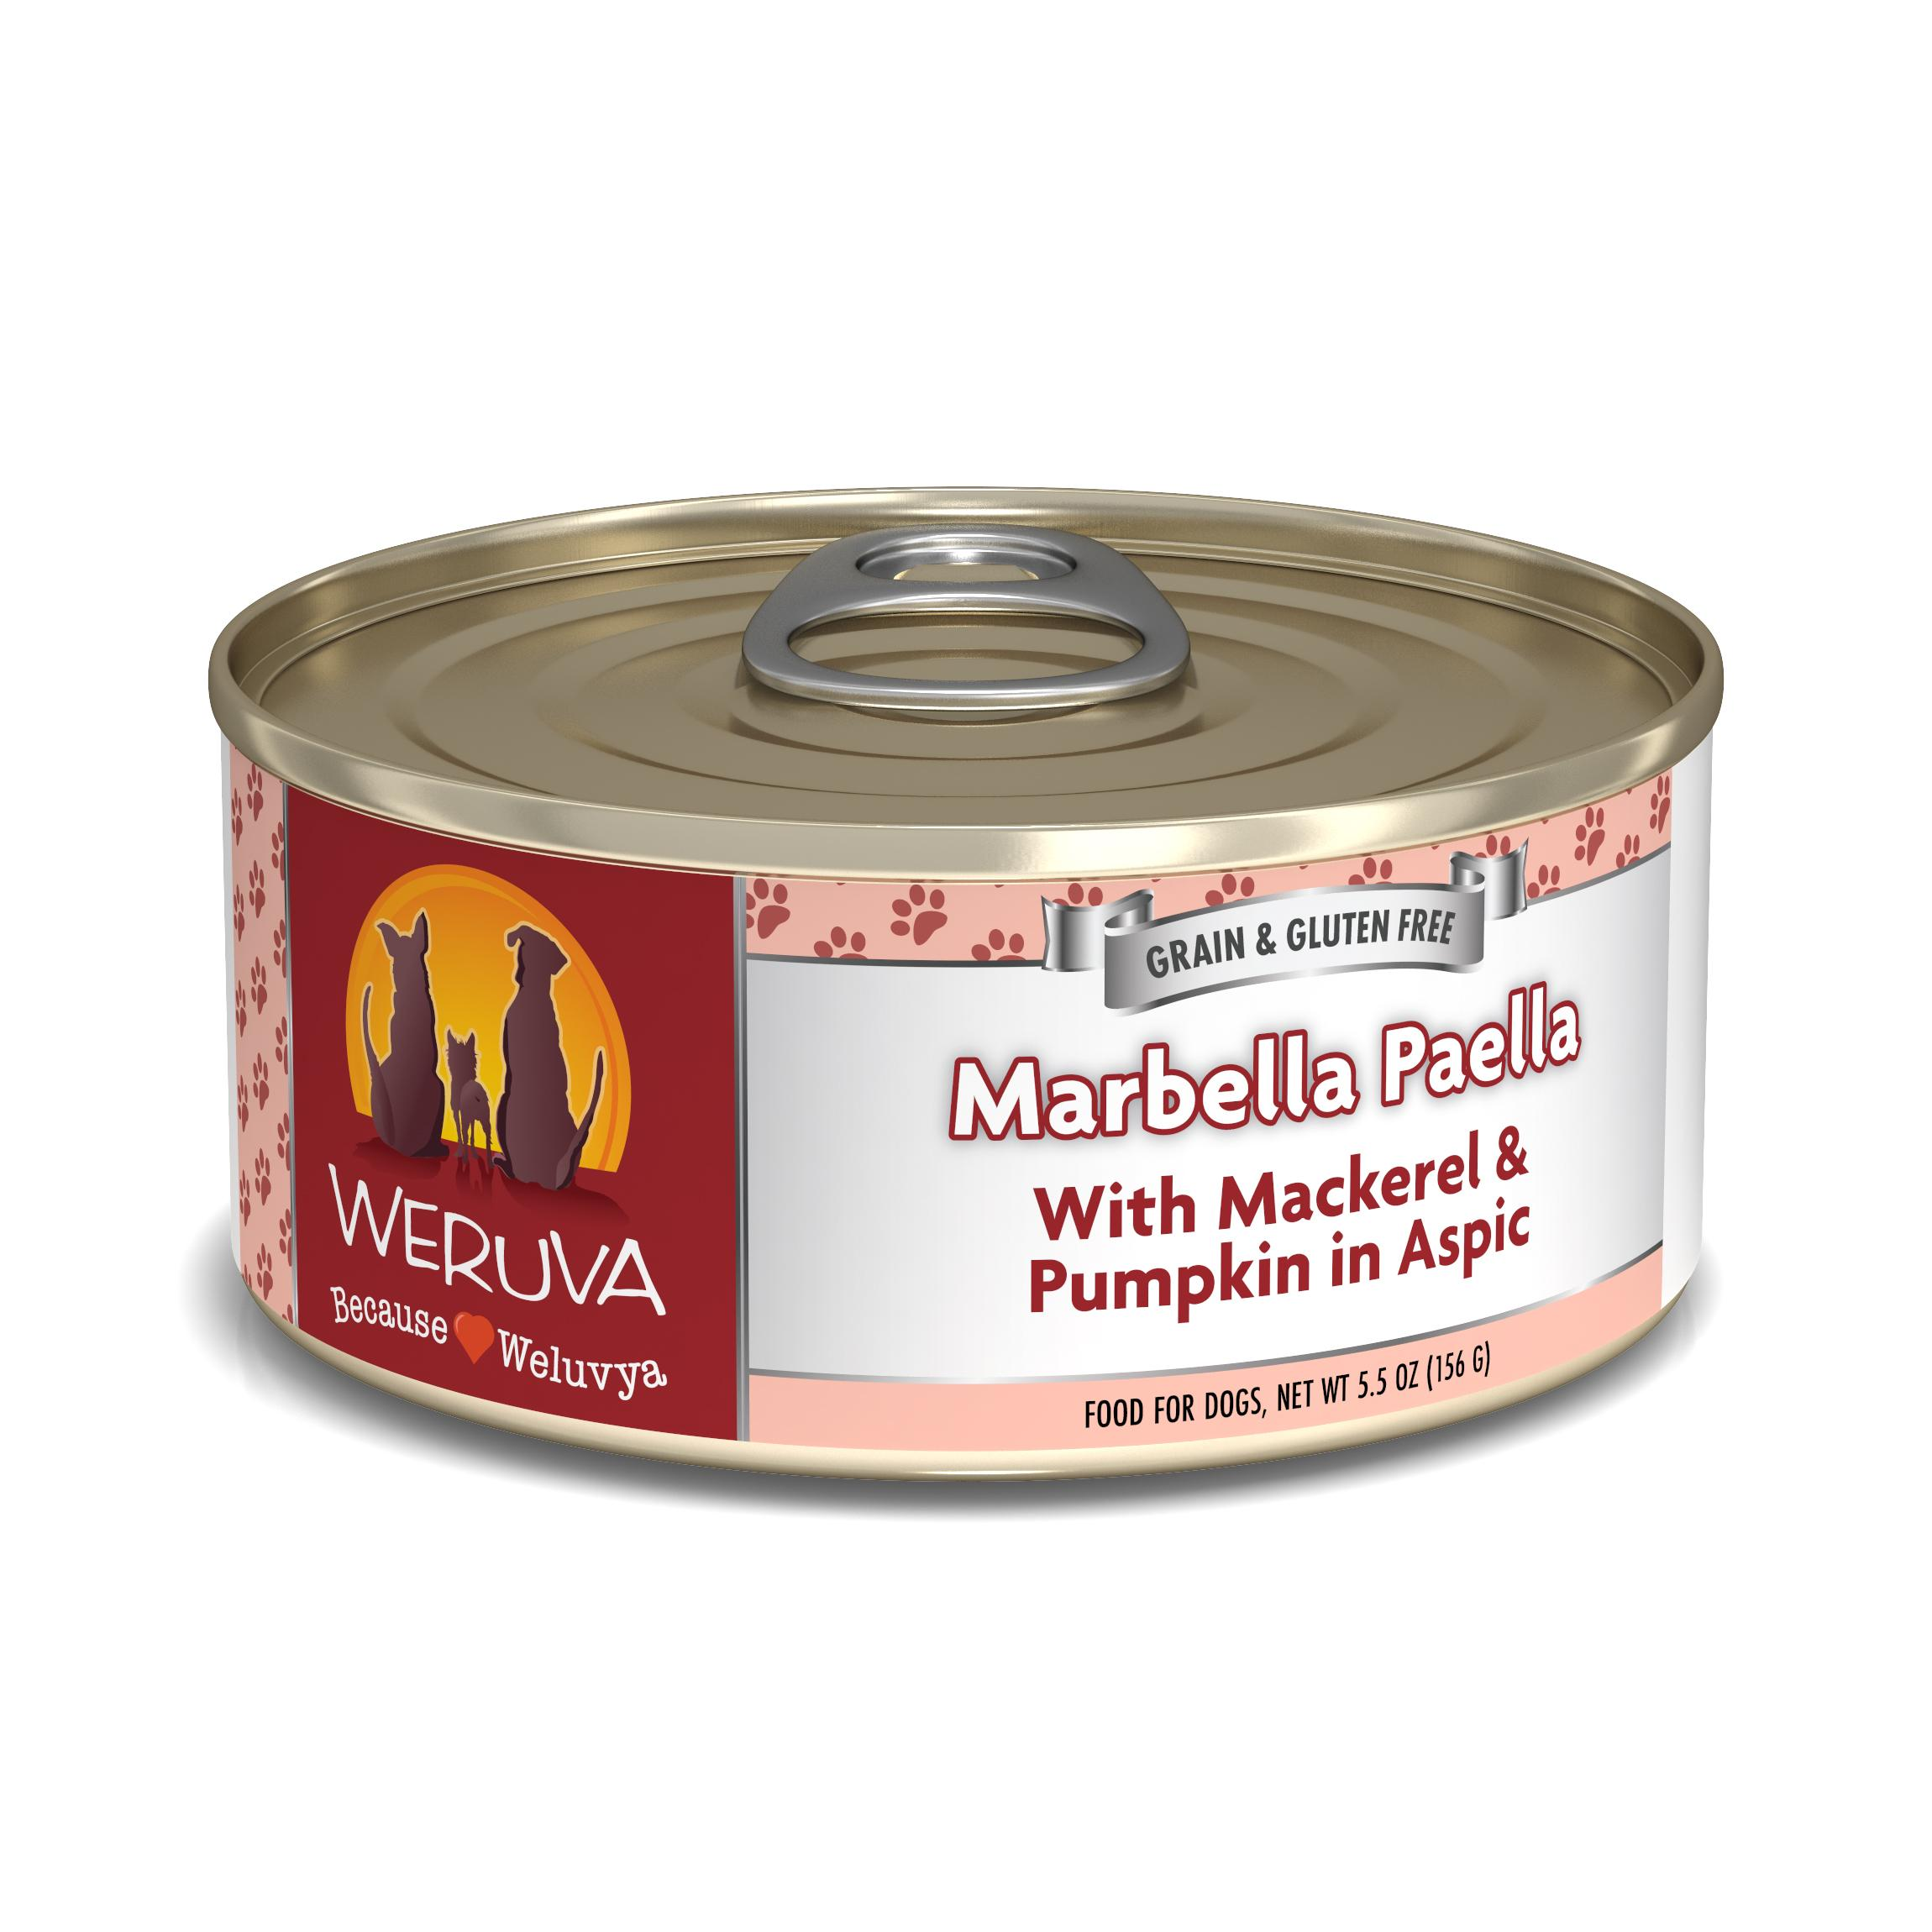 Weruva Dog Classic Marbella Paella with Mackerel & Pumpkin in Aspic Grain-Free Wet Dog Food Image